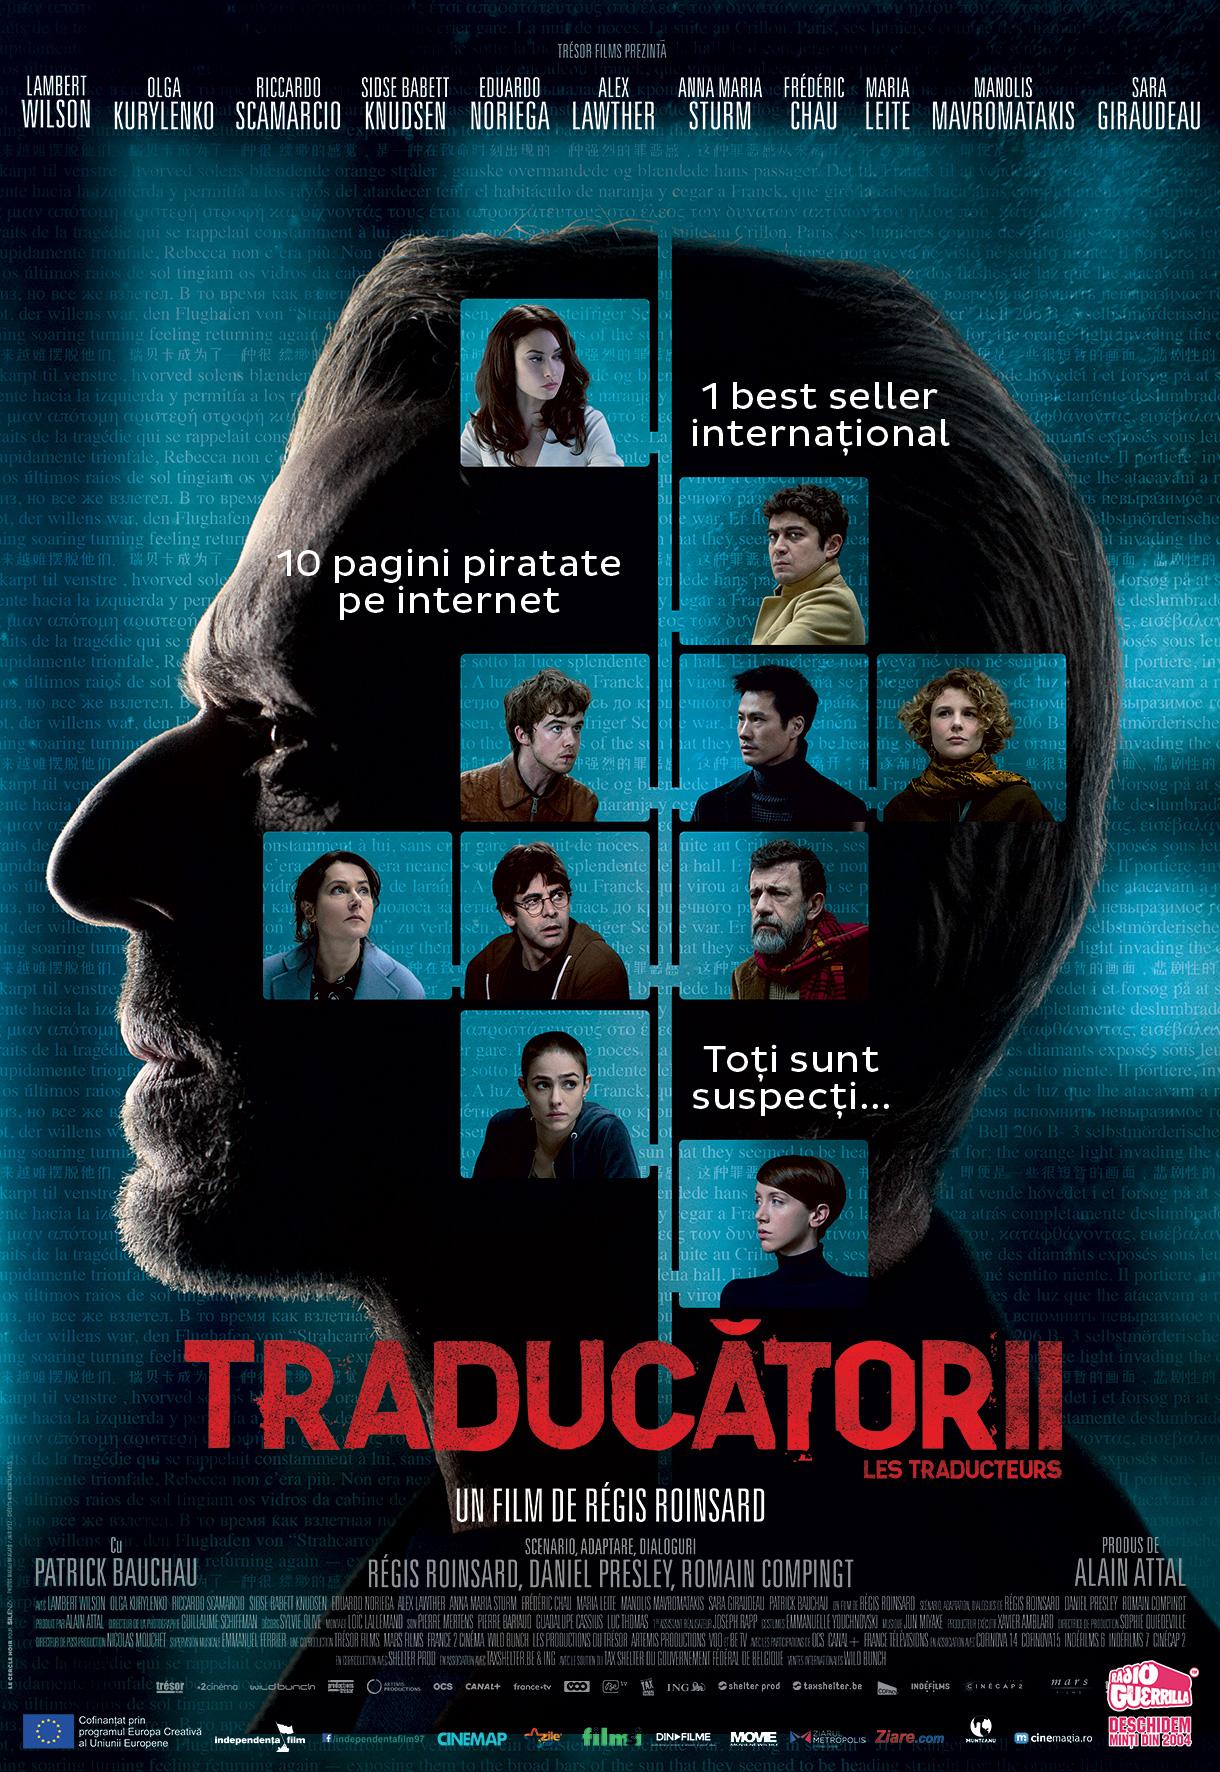 Traducatorii - Le Traducteurs poster